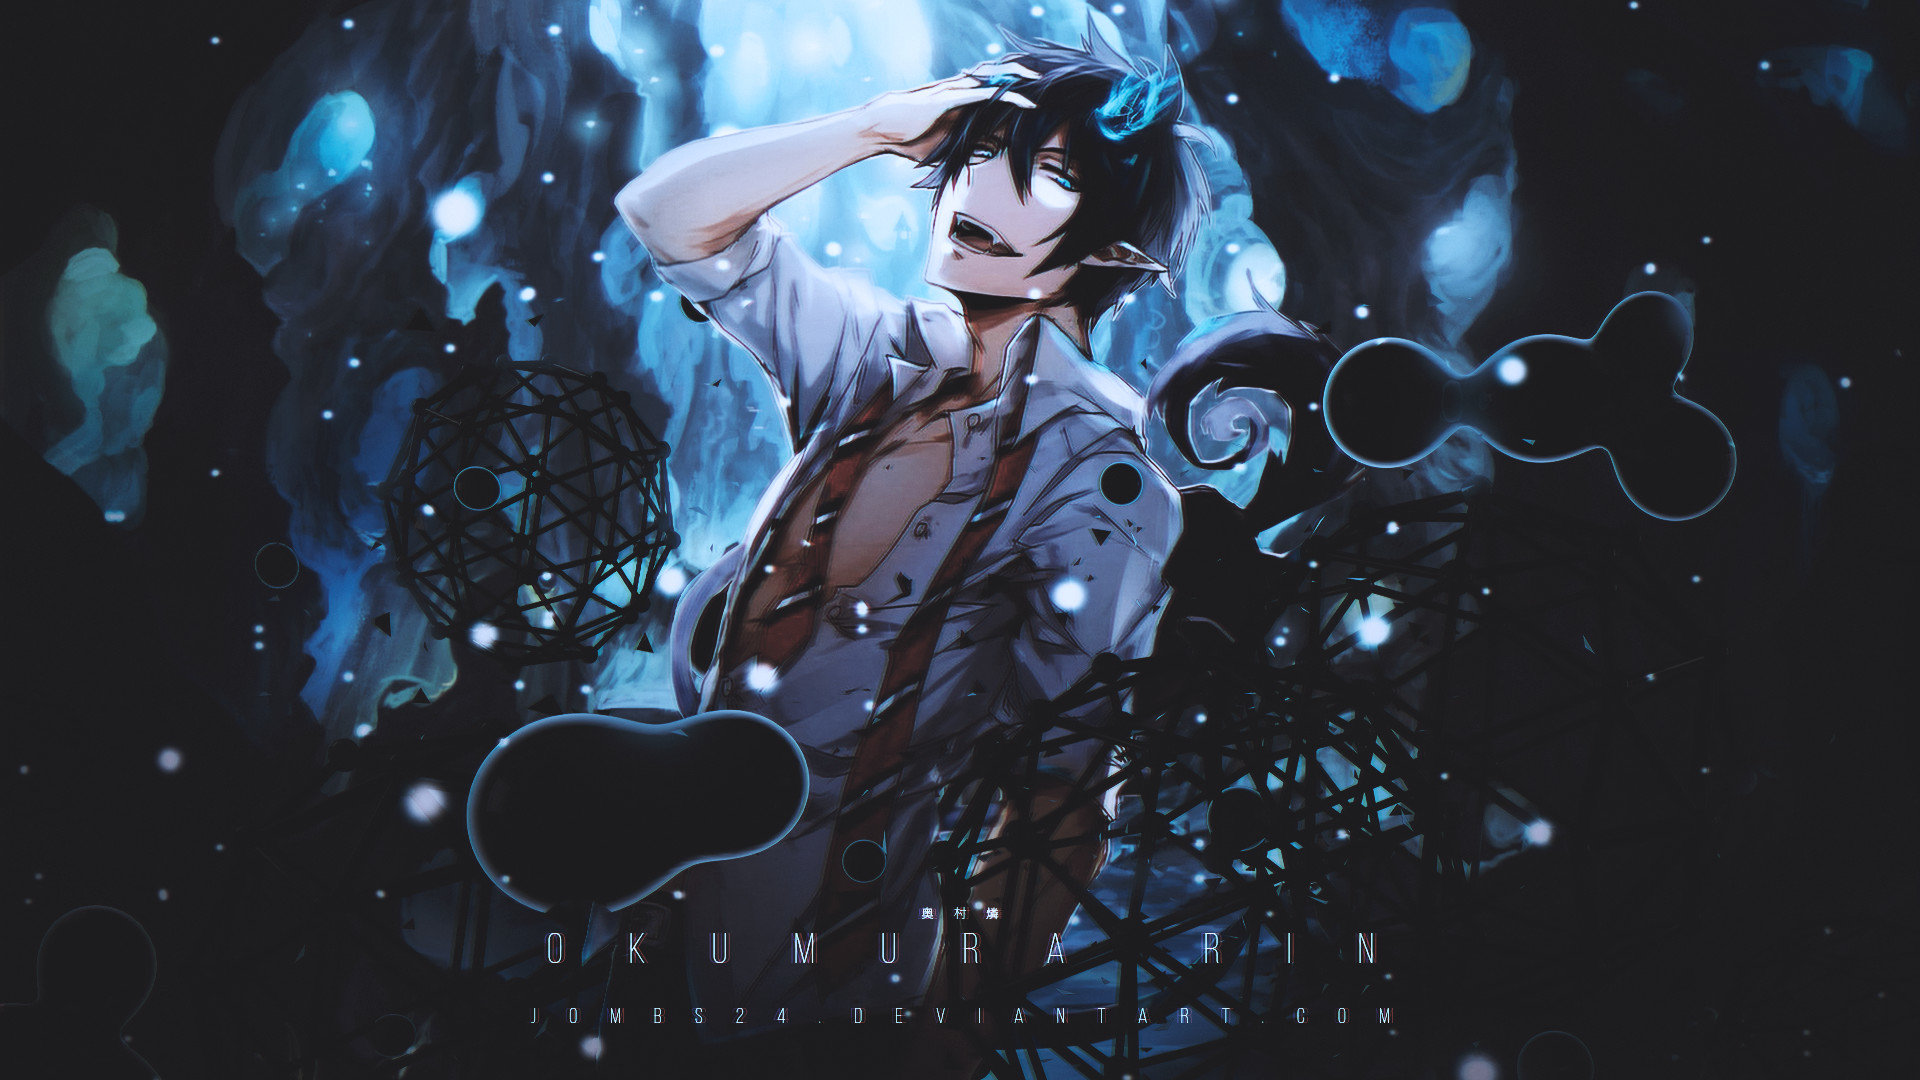 Rin Okumura Wallpapers Top Free Rin Okumura Backgrounds Wallpaperaccess See more ideas about rin, free eternal summer, free iwatobi. rin okumura wallpapers top free rin